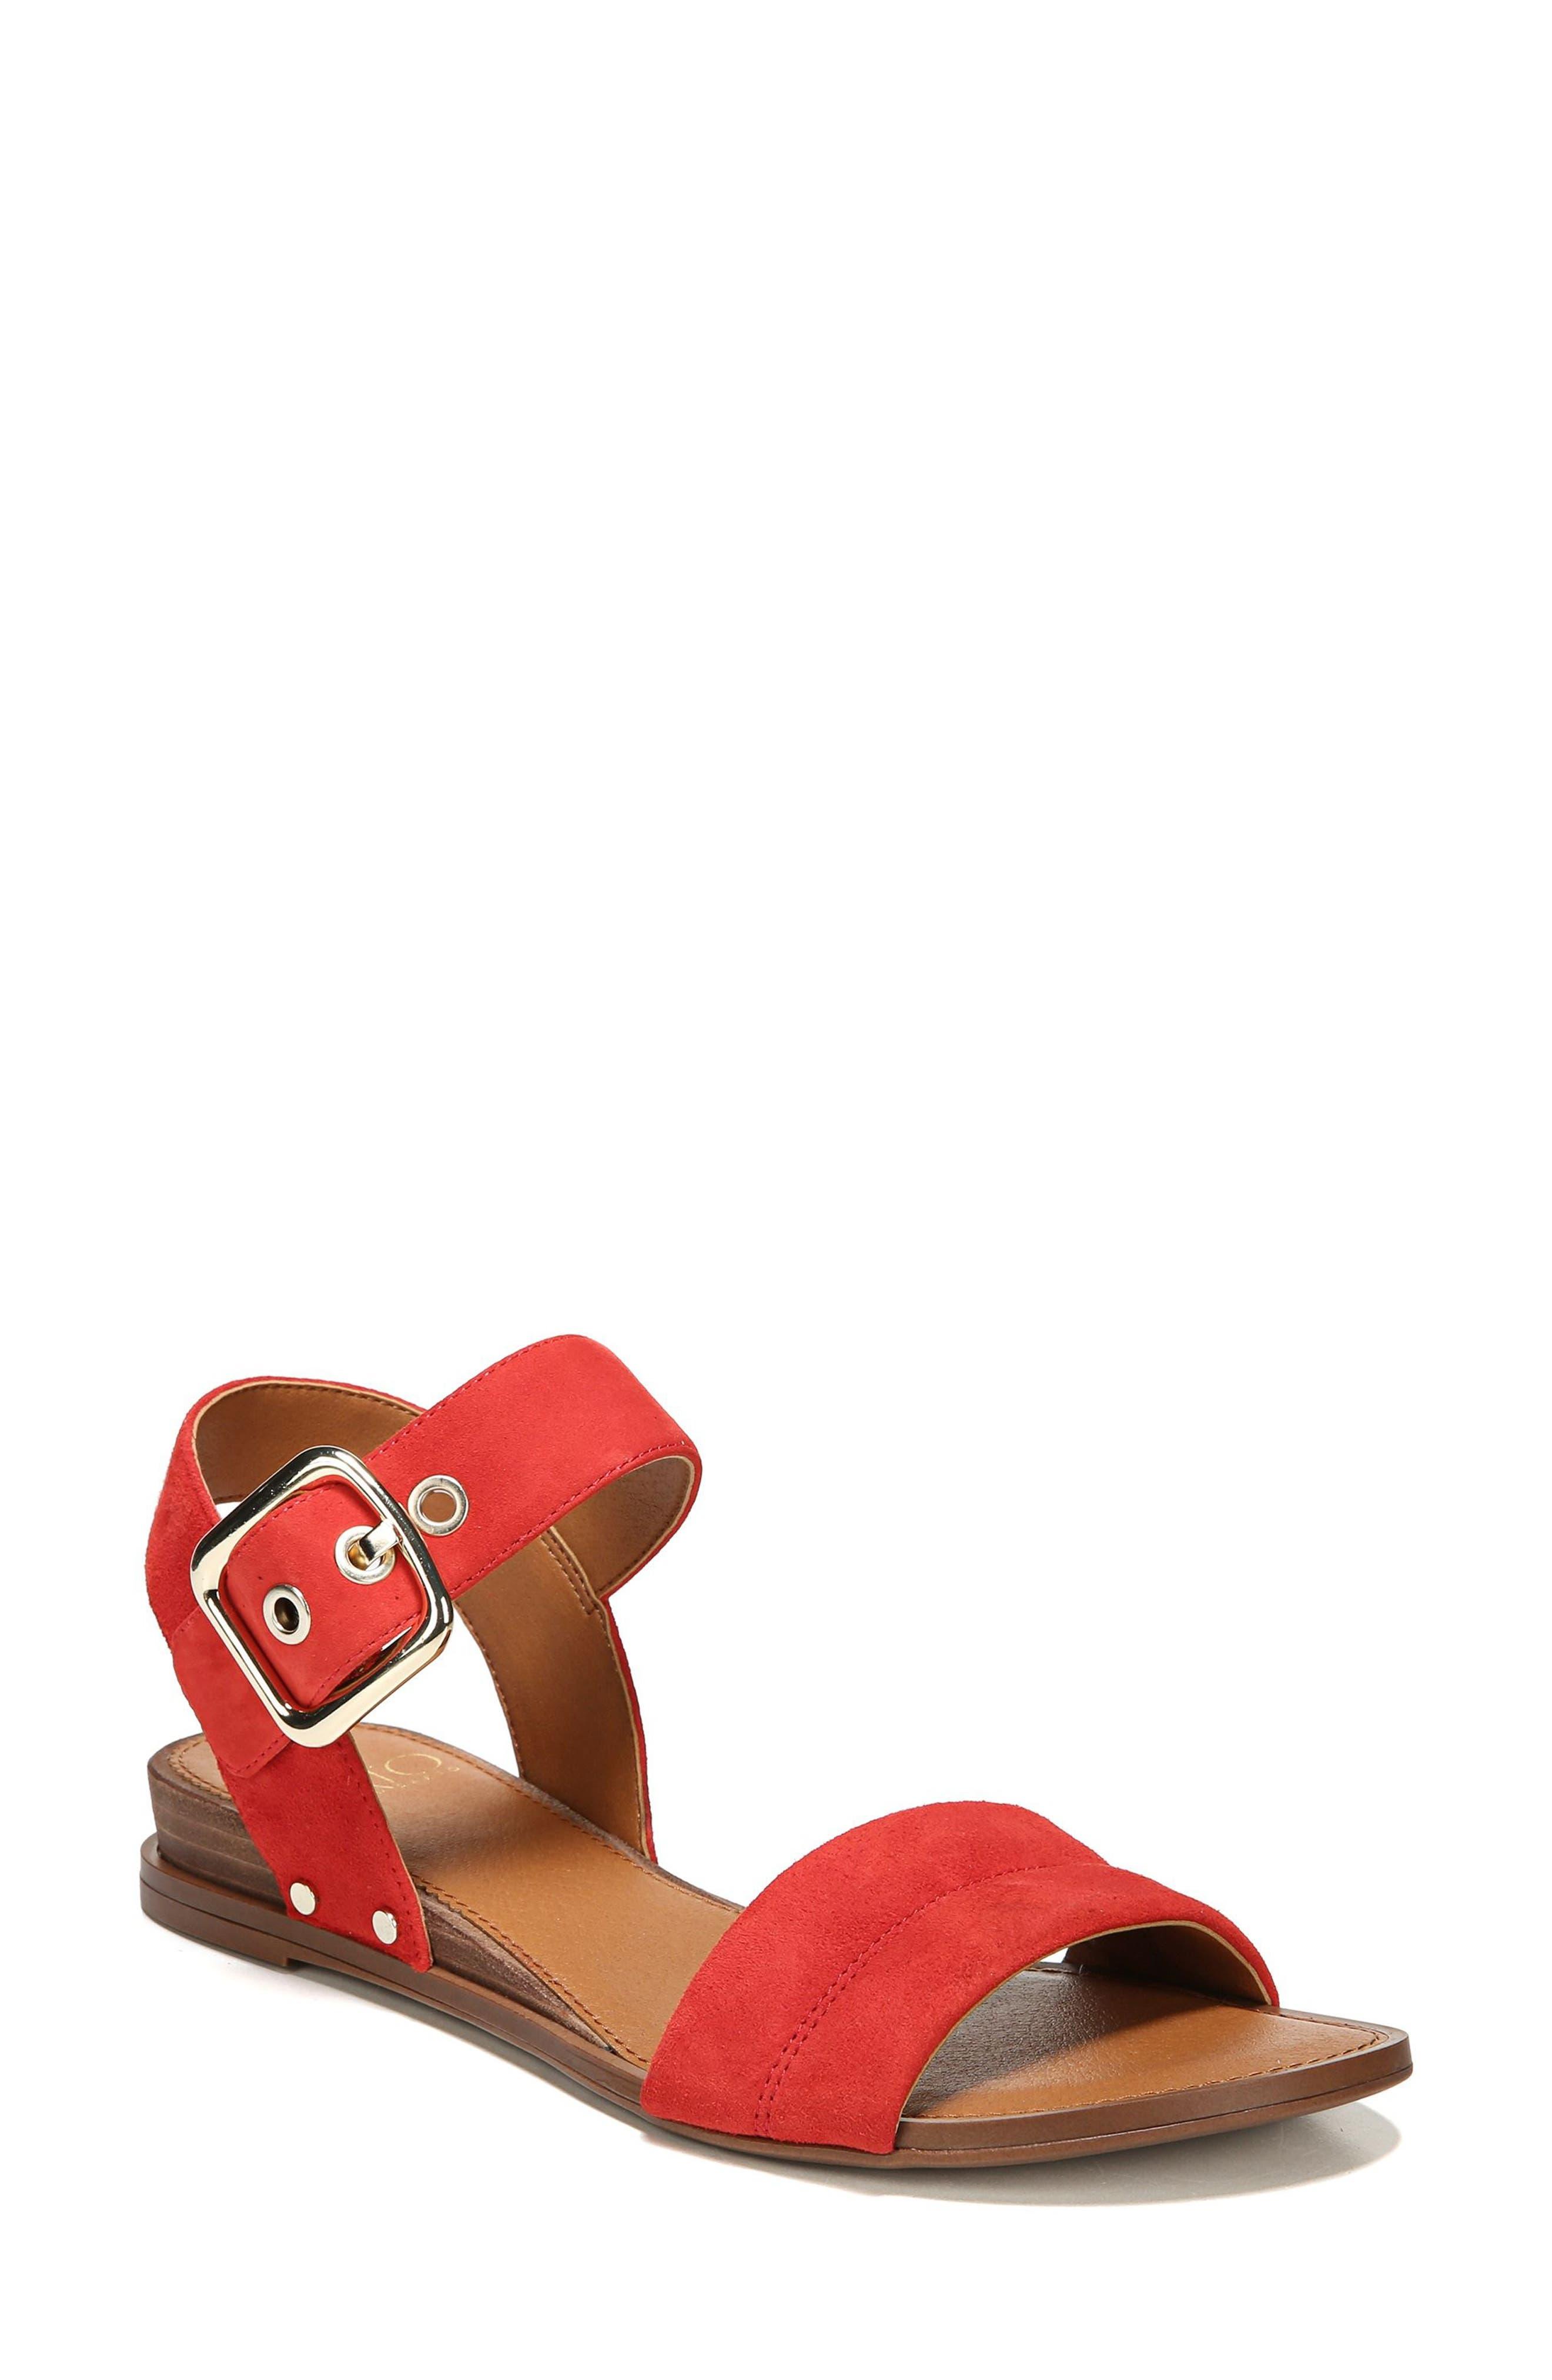 Patterson Low Wedge Sandal,                             Main thumbnail 1, color,                             Pop Red Suede